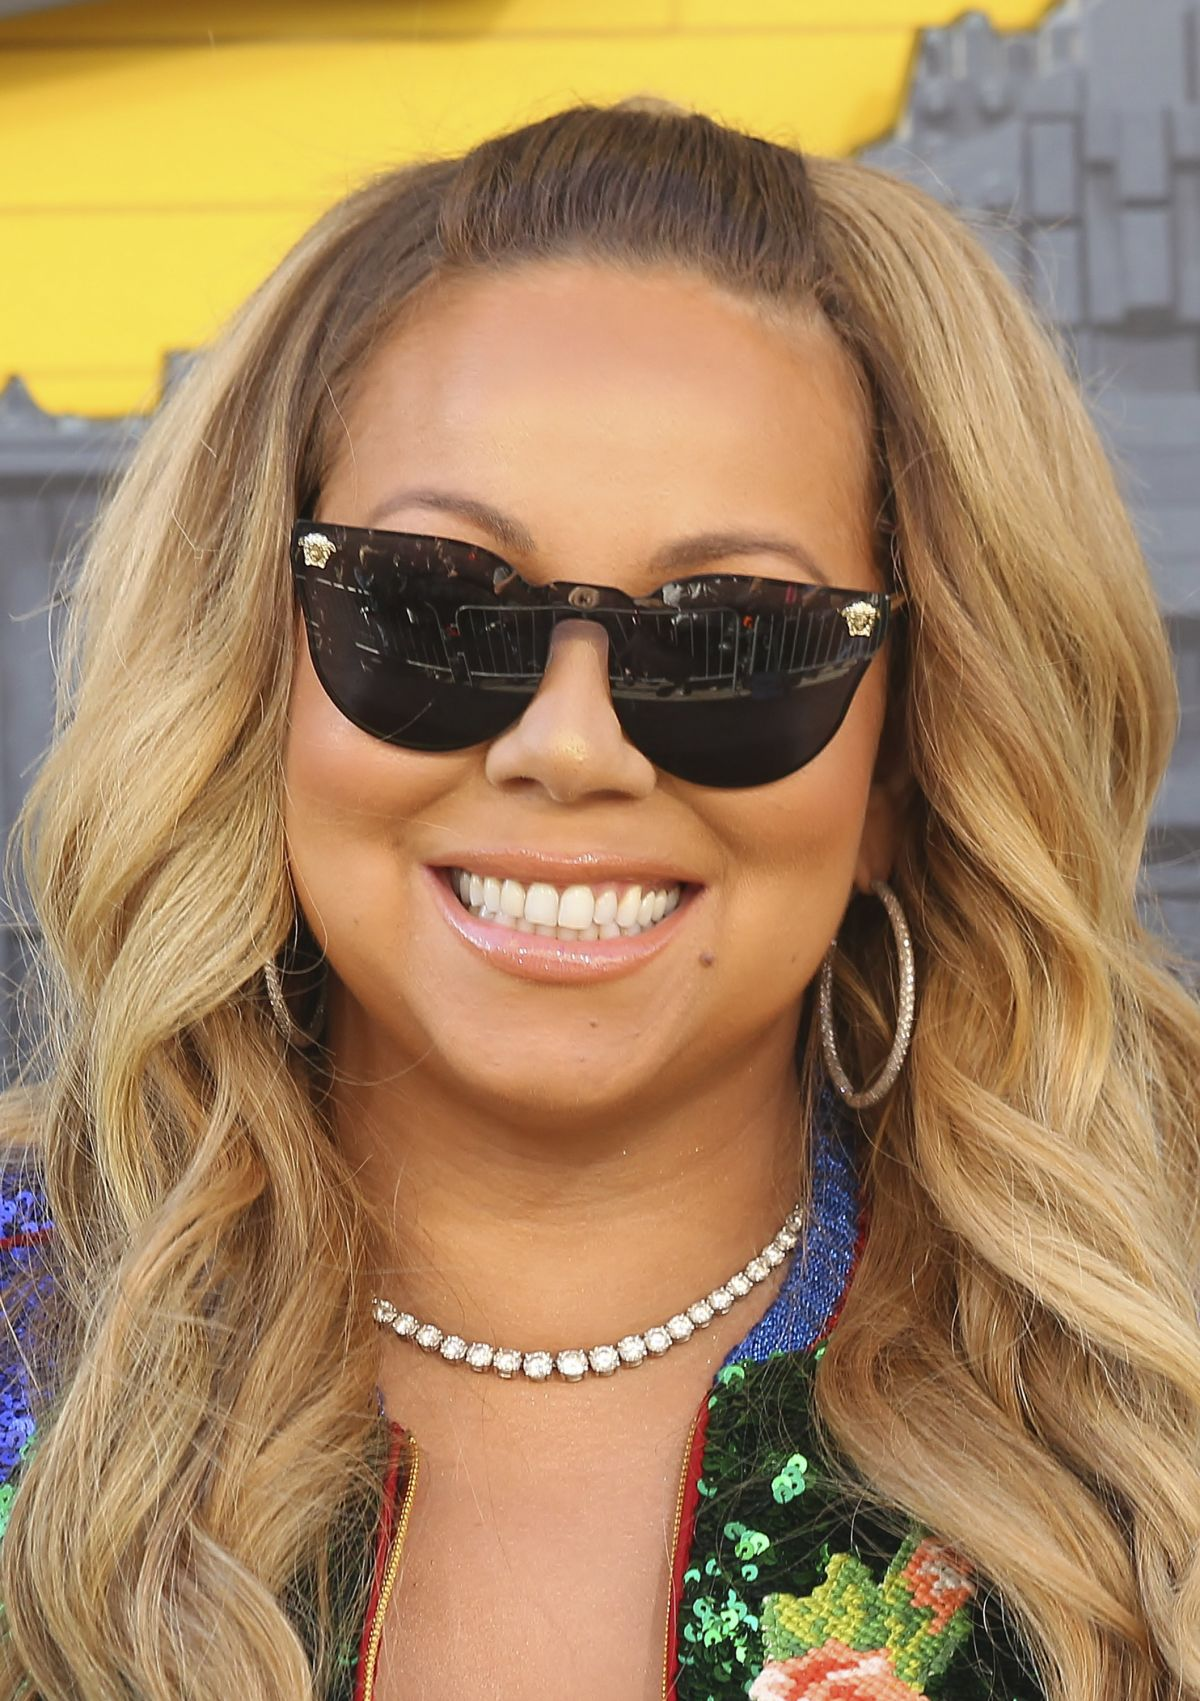 Mariah Carey Archives - Page 2 of 18 - HawtCelebs - HawtCelebs Mariah Carey